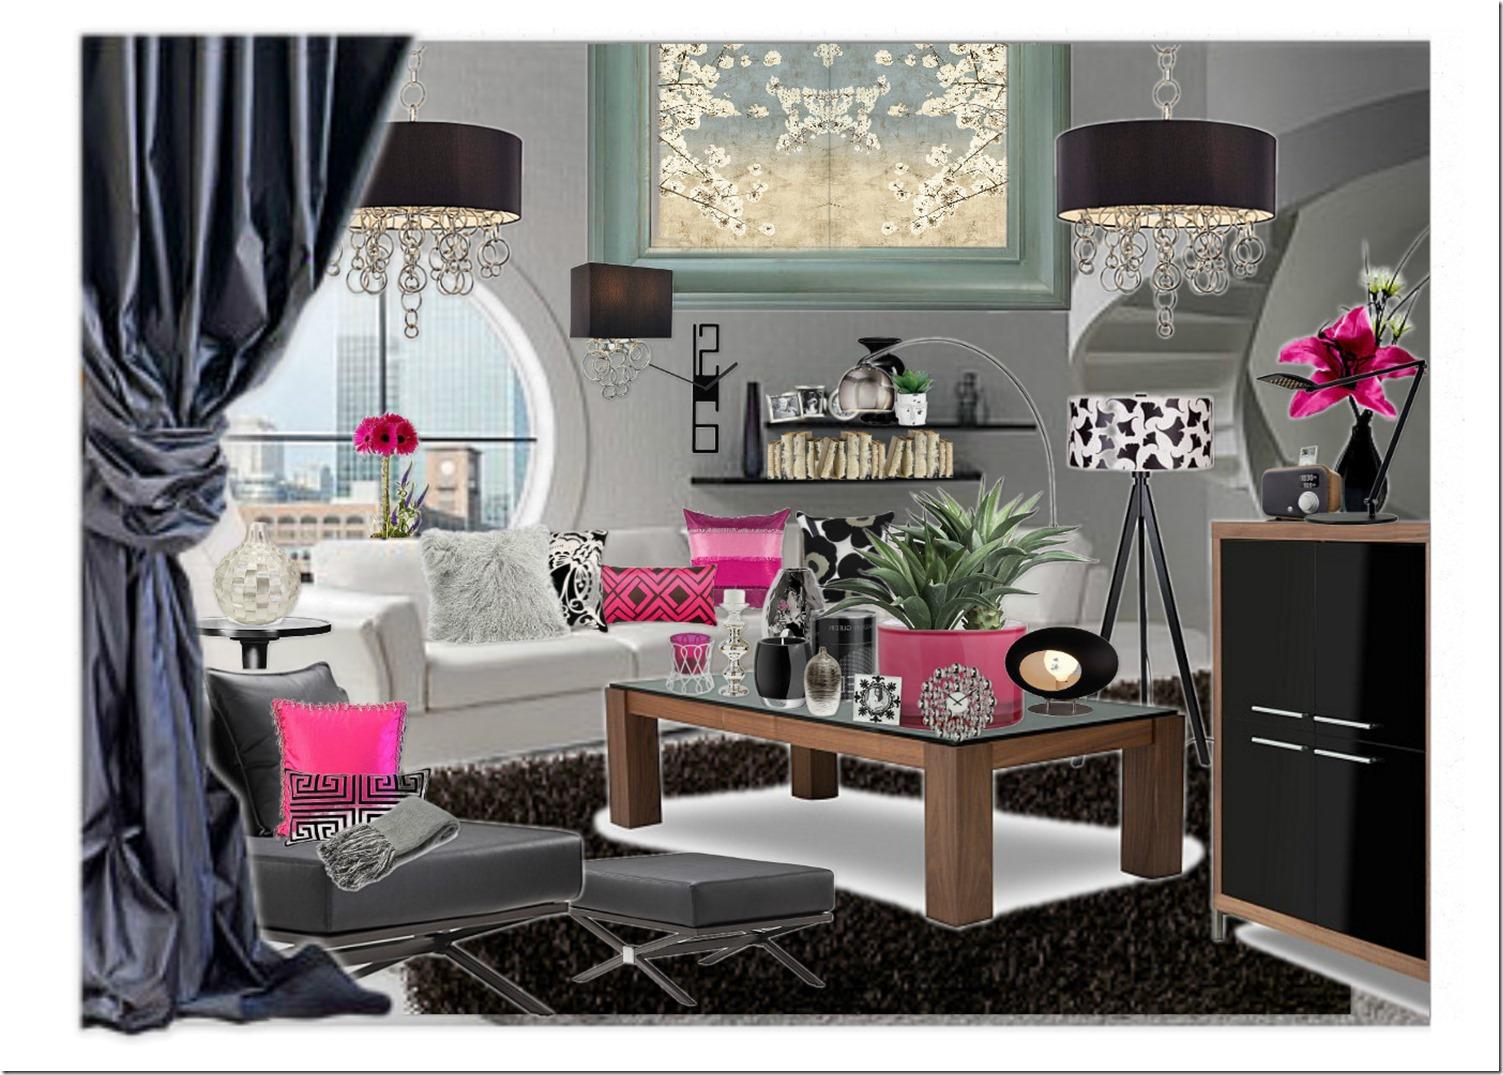 OB-stylish and light modern loft - somewhere in europe!